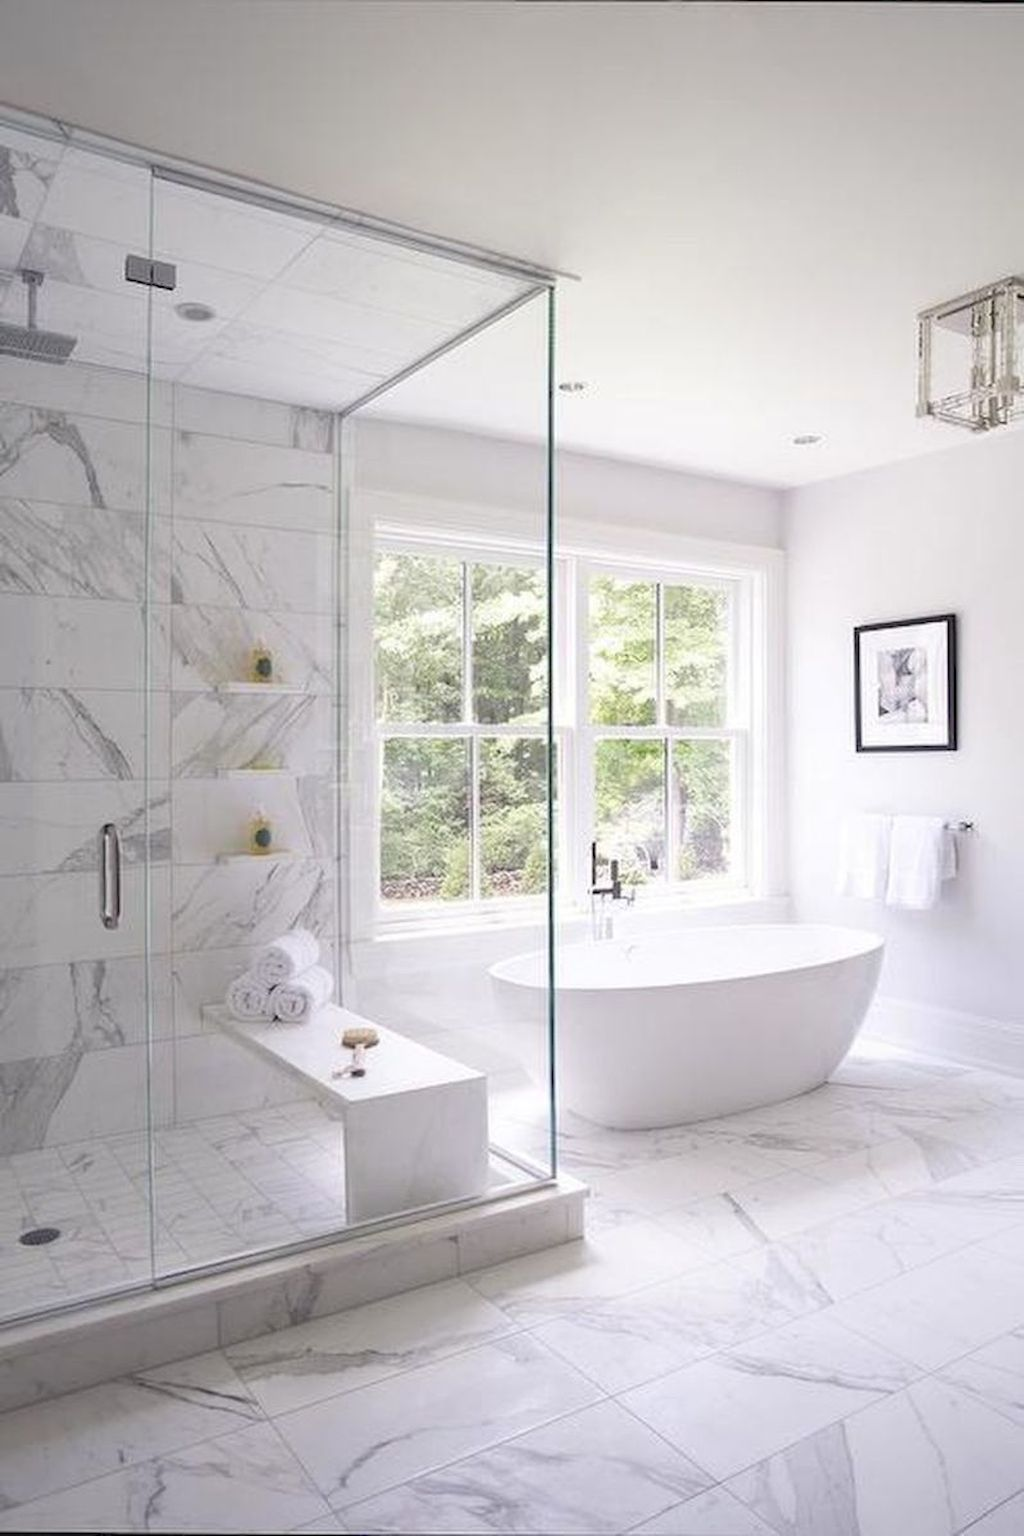 Stunning 90 Master Bathroom Decorating Ideas With Images Small Master Bathroom Bathroom Remodel Master Modern Master Bathroom